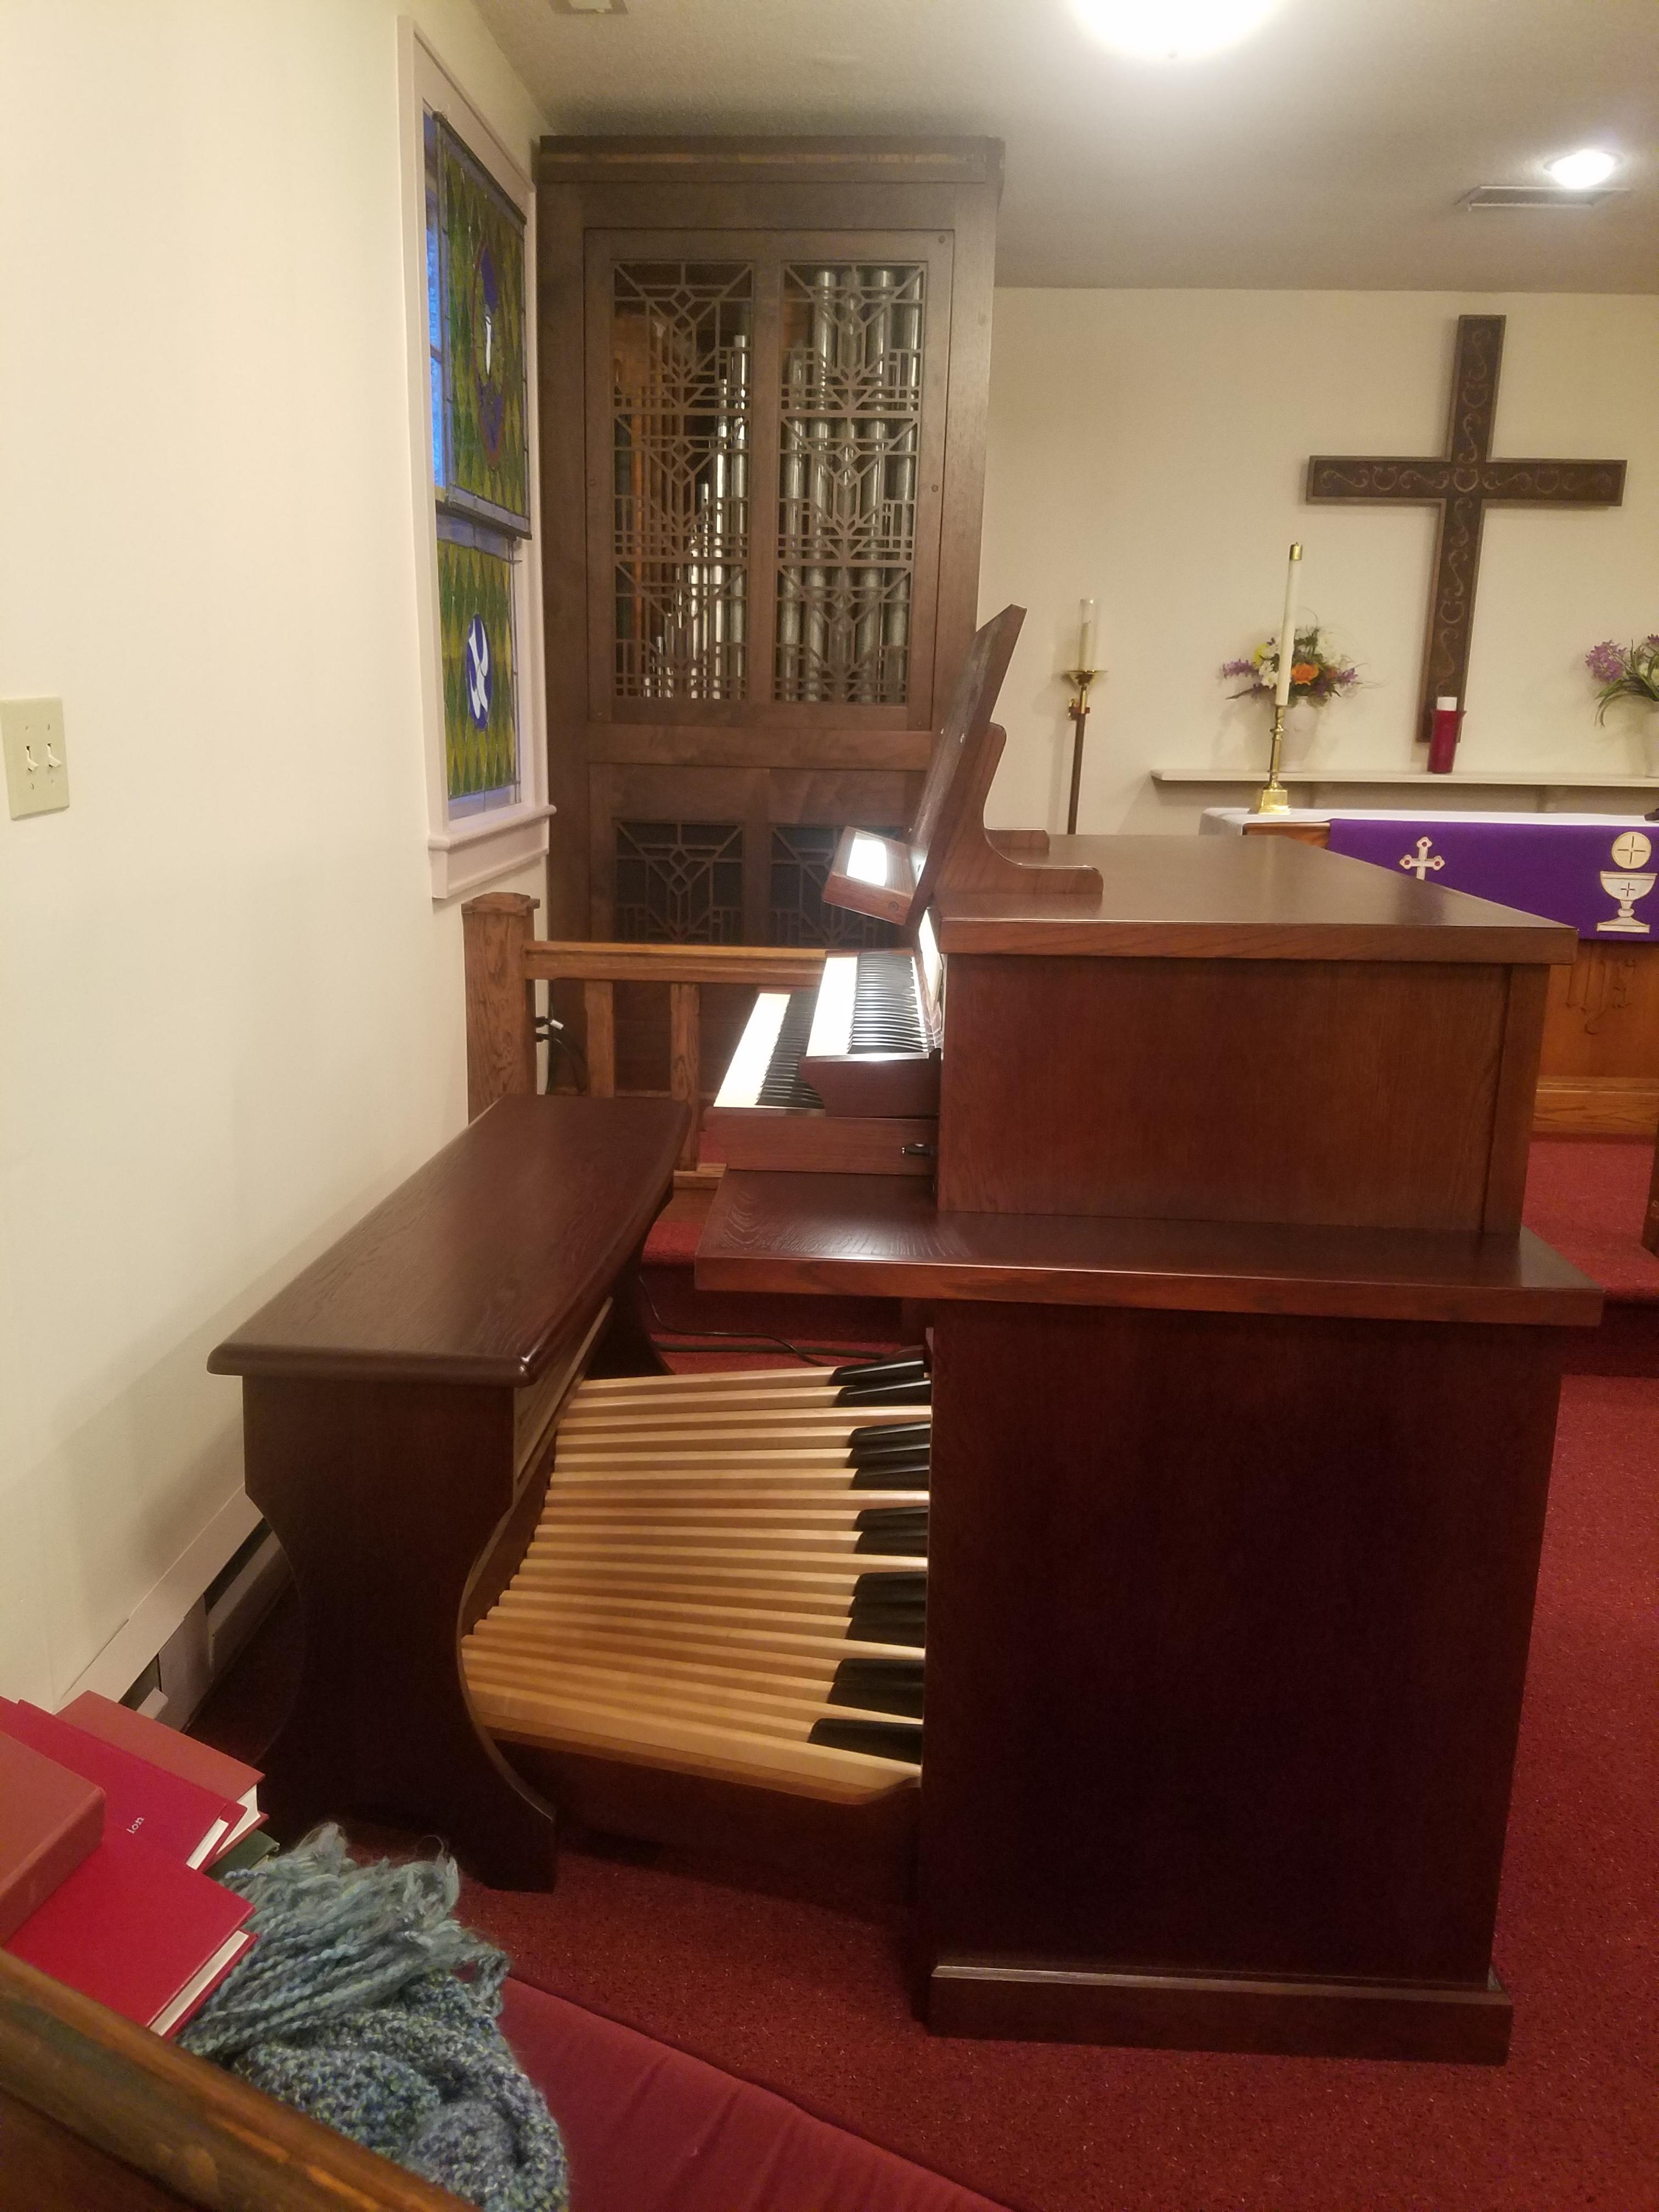 Opus 147 | Church of the Saviour | Newland, NC - Cornel Zimmer Organ ...